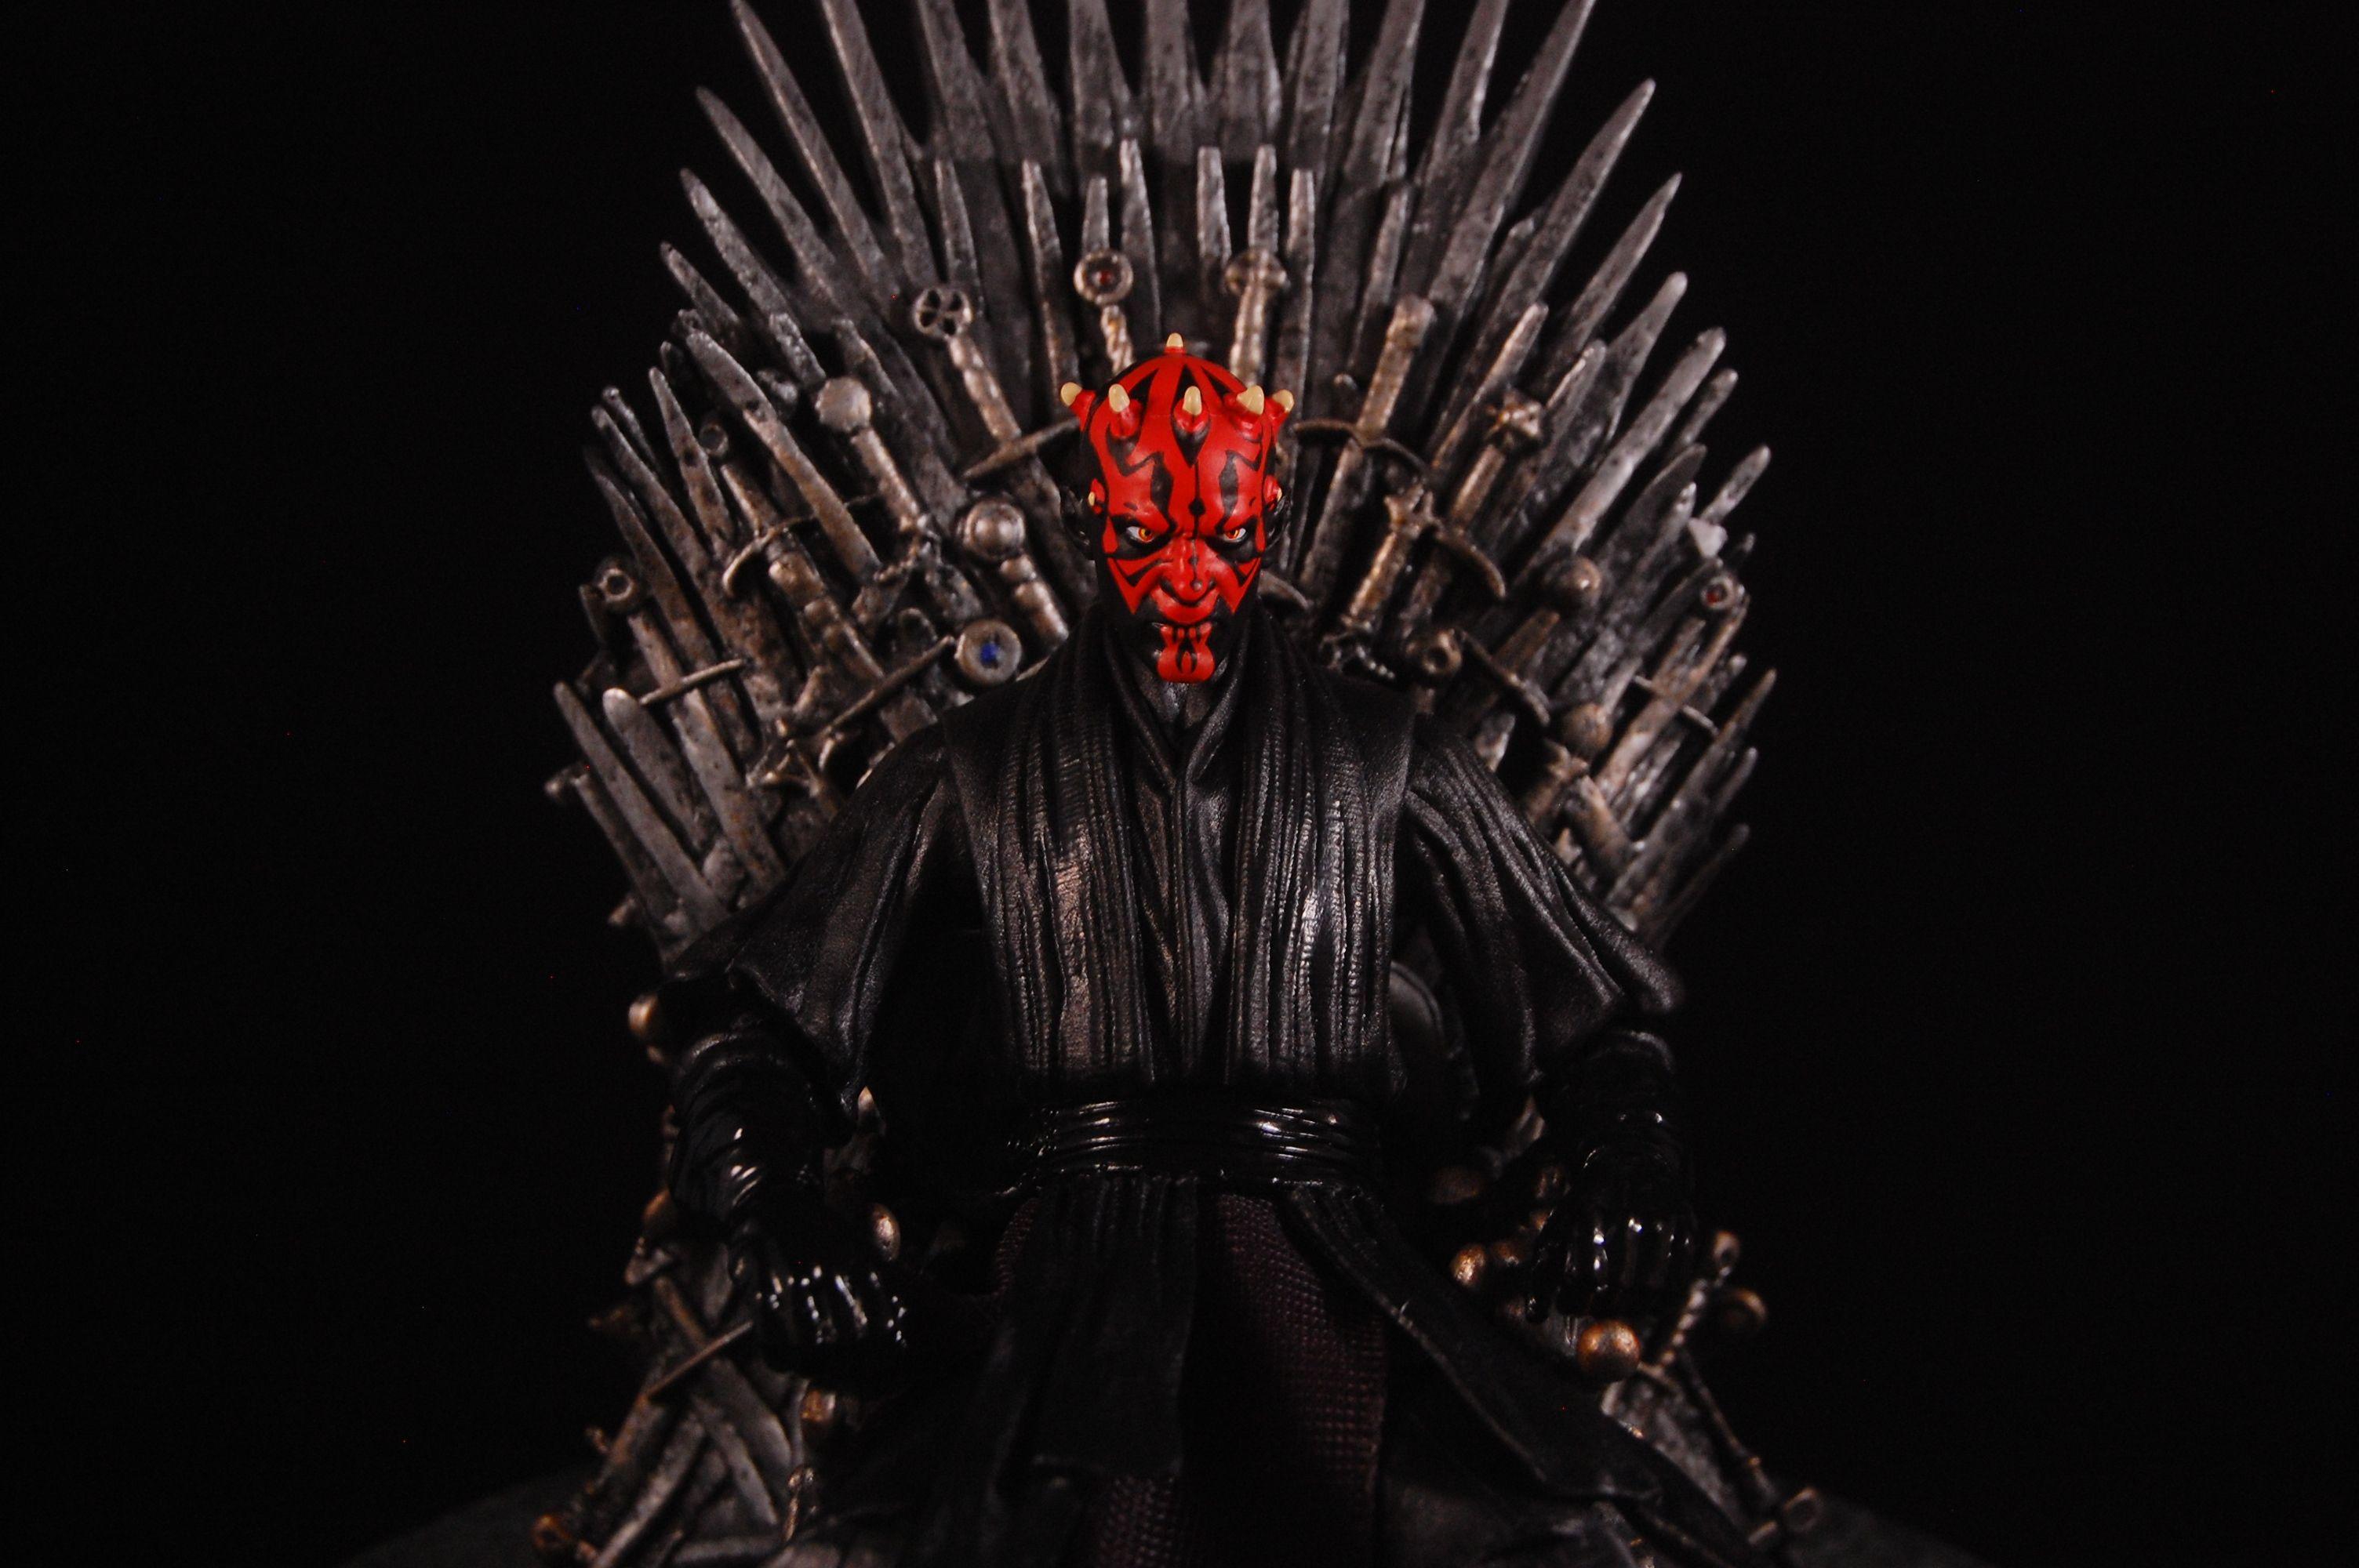 Iron Throne Darth Maul Star Wars Game Of Thrones Fun With Darth